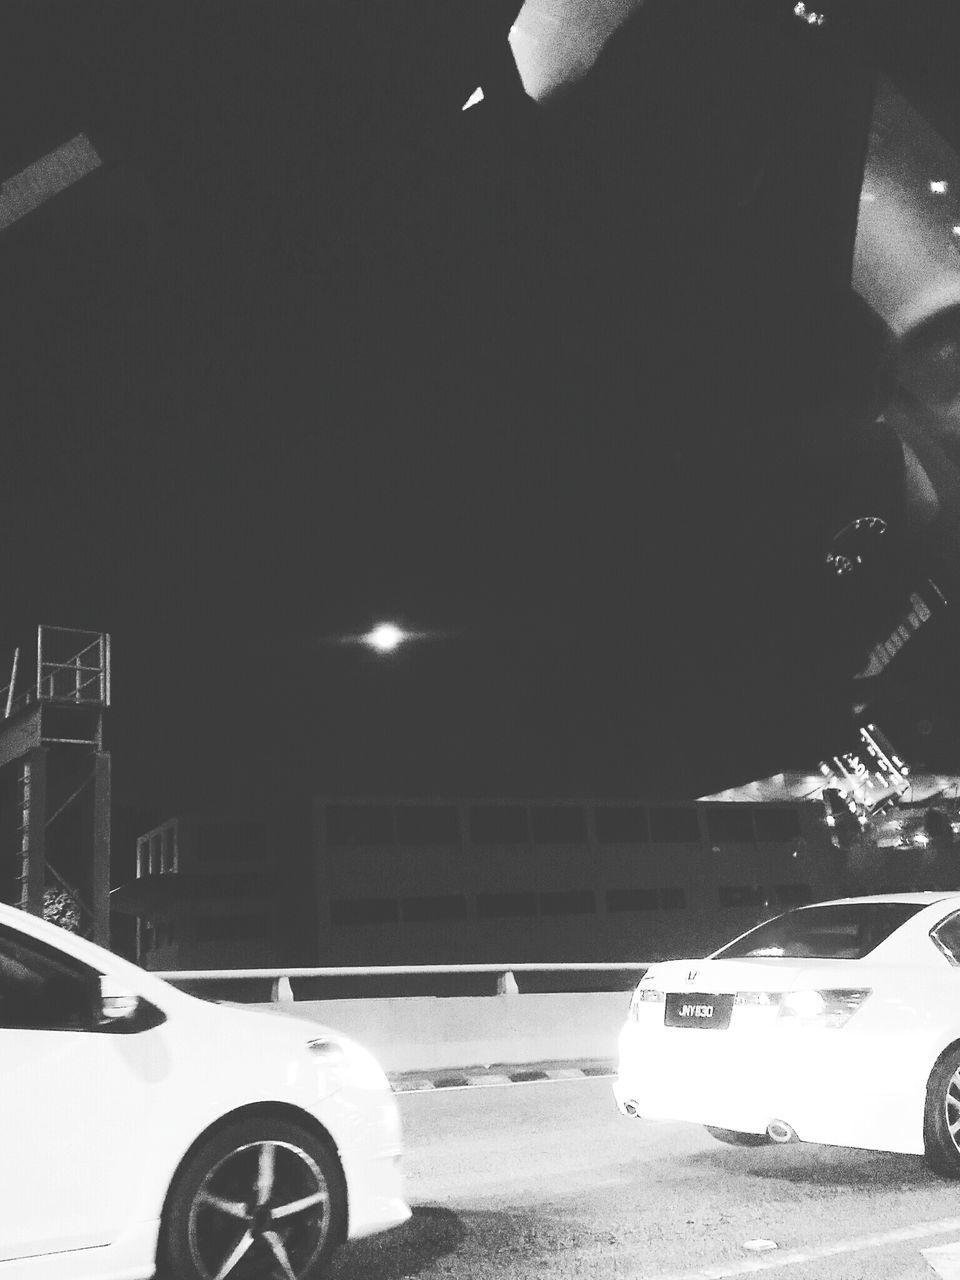 car, illuminated, night, transportation, land vehicle, mode of transport, lighting equipment, no people, outdoors